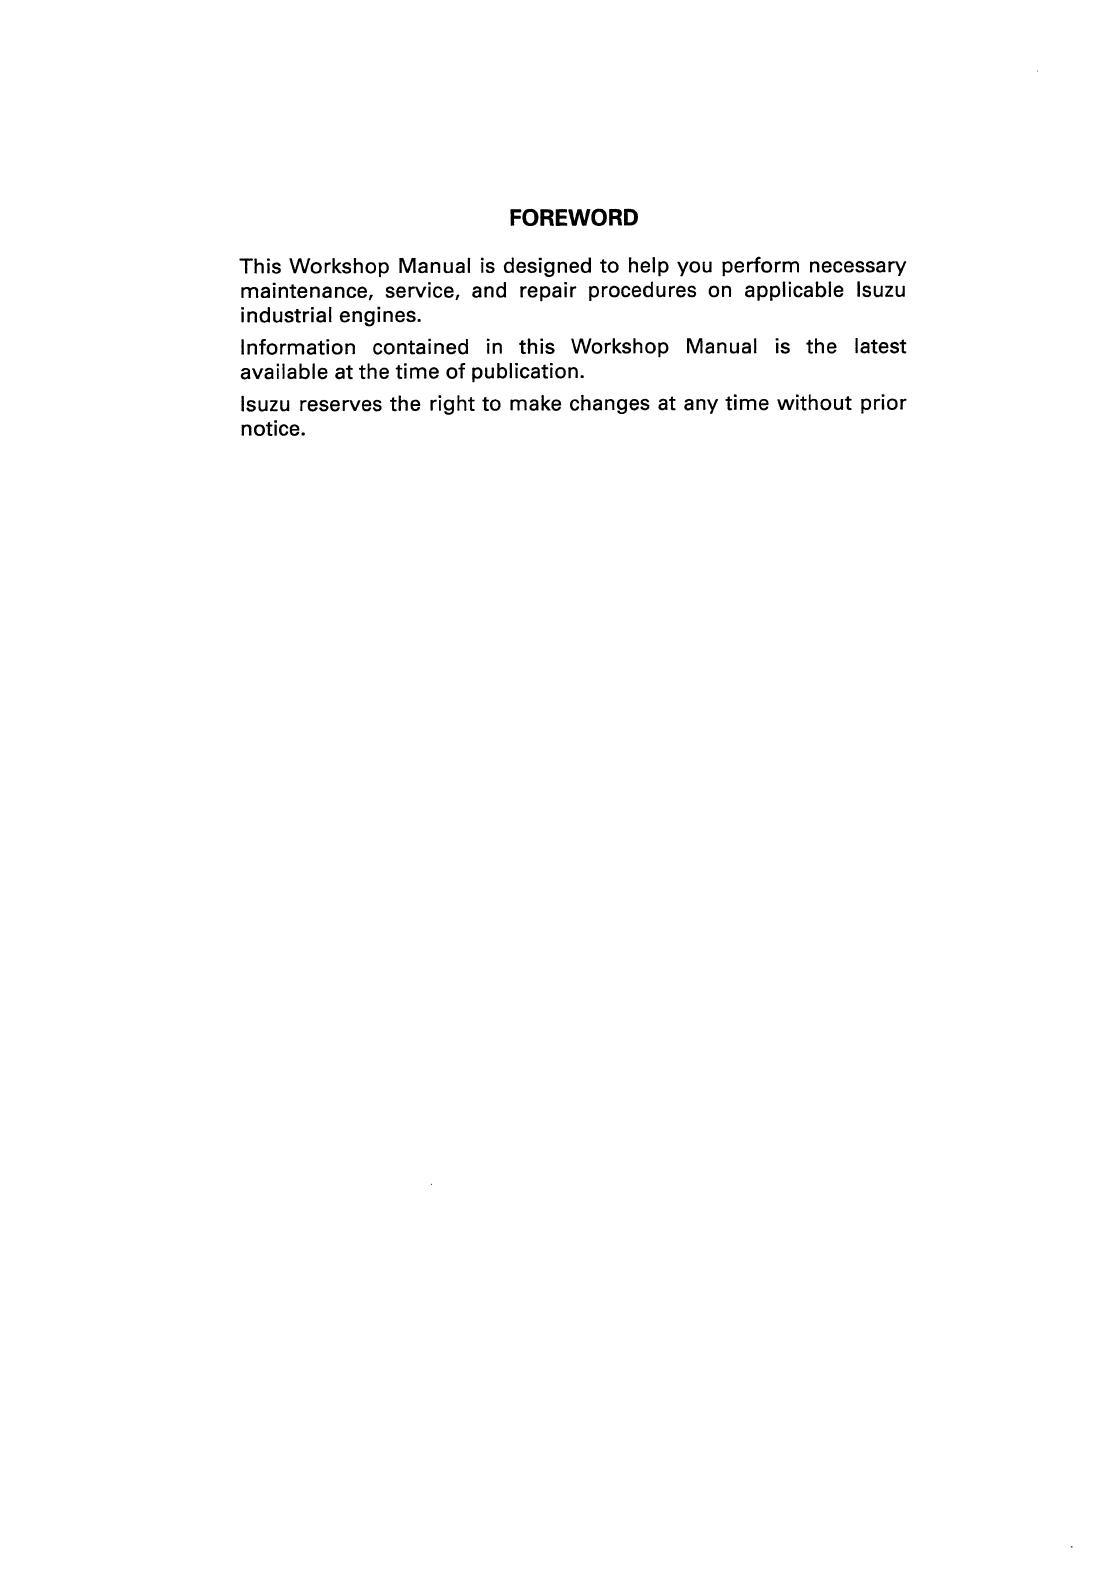 981 0525 Onan Hdcaa Hdcab Hdcac Hdcad Spec A D Isuzu 3la1 3lb1 Engine Diagram 0981 Impplanname Outputdate Outputtime Cyan Magenta